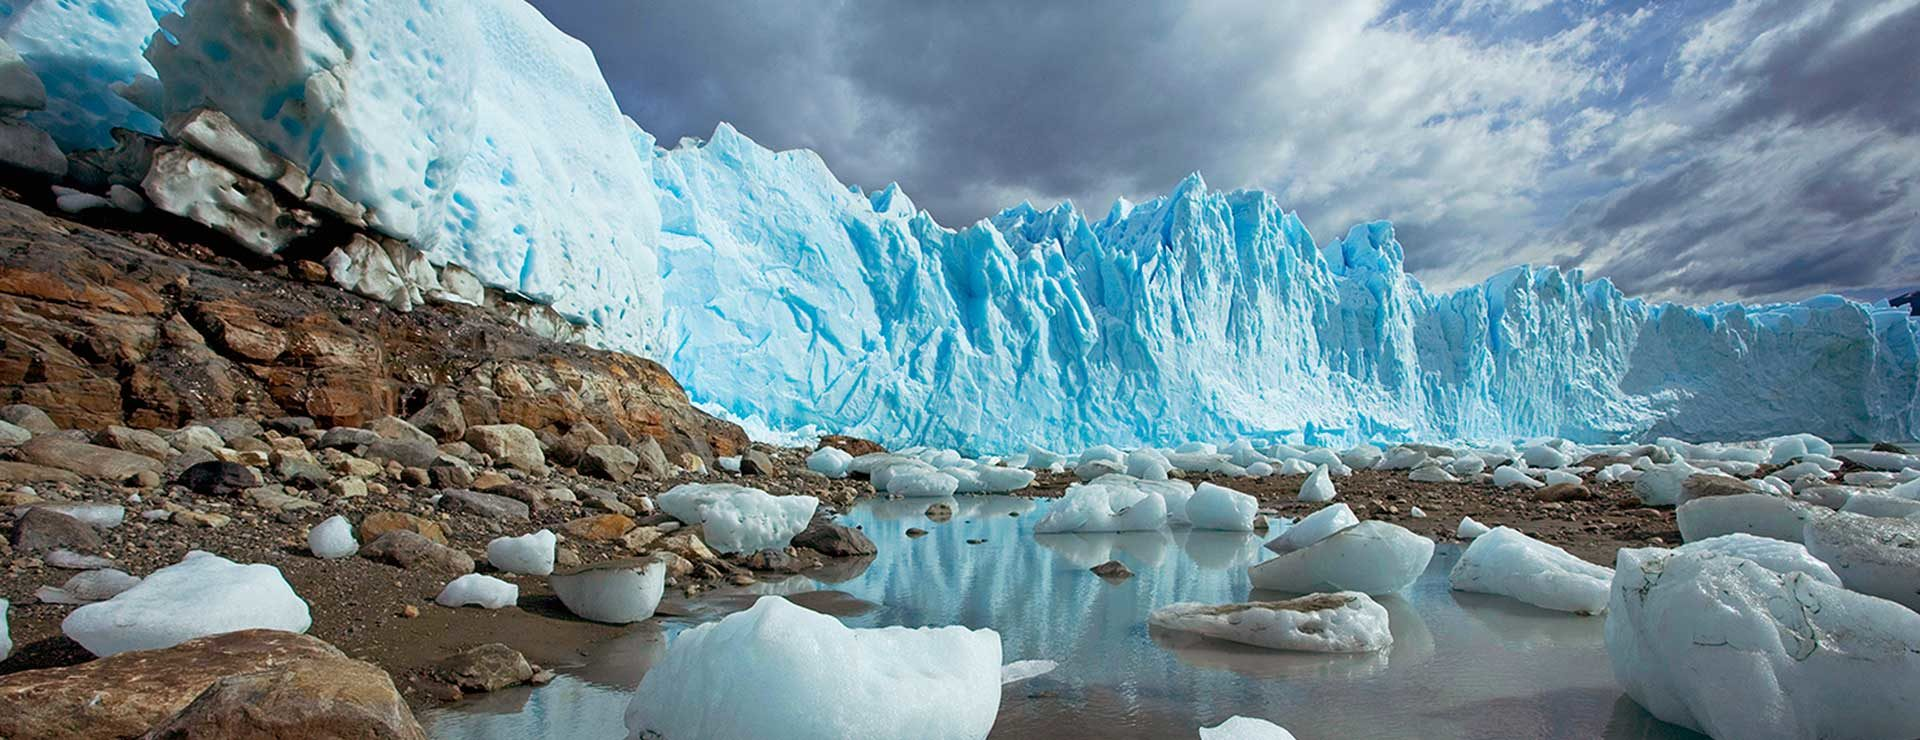 Perito Moreno Glaciar Patagonia